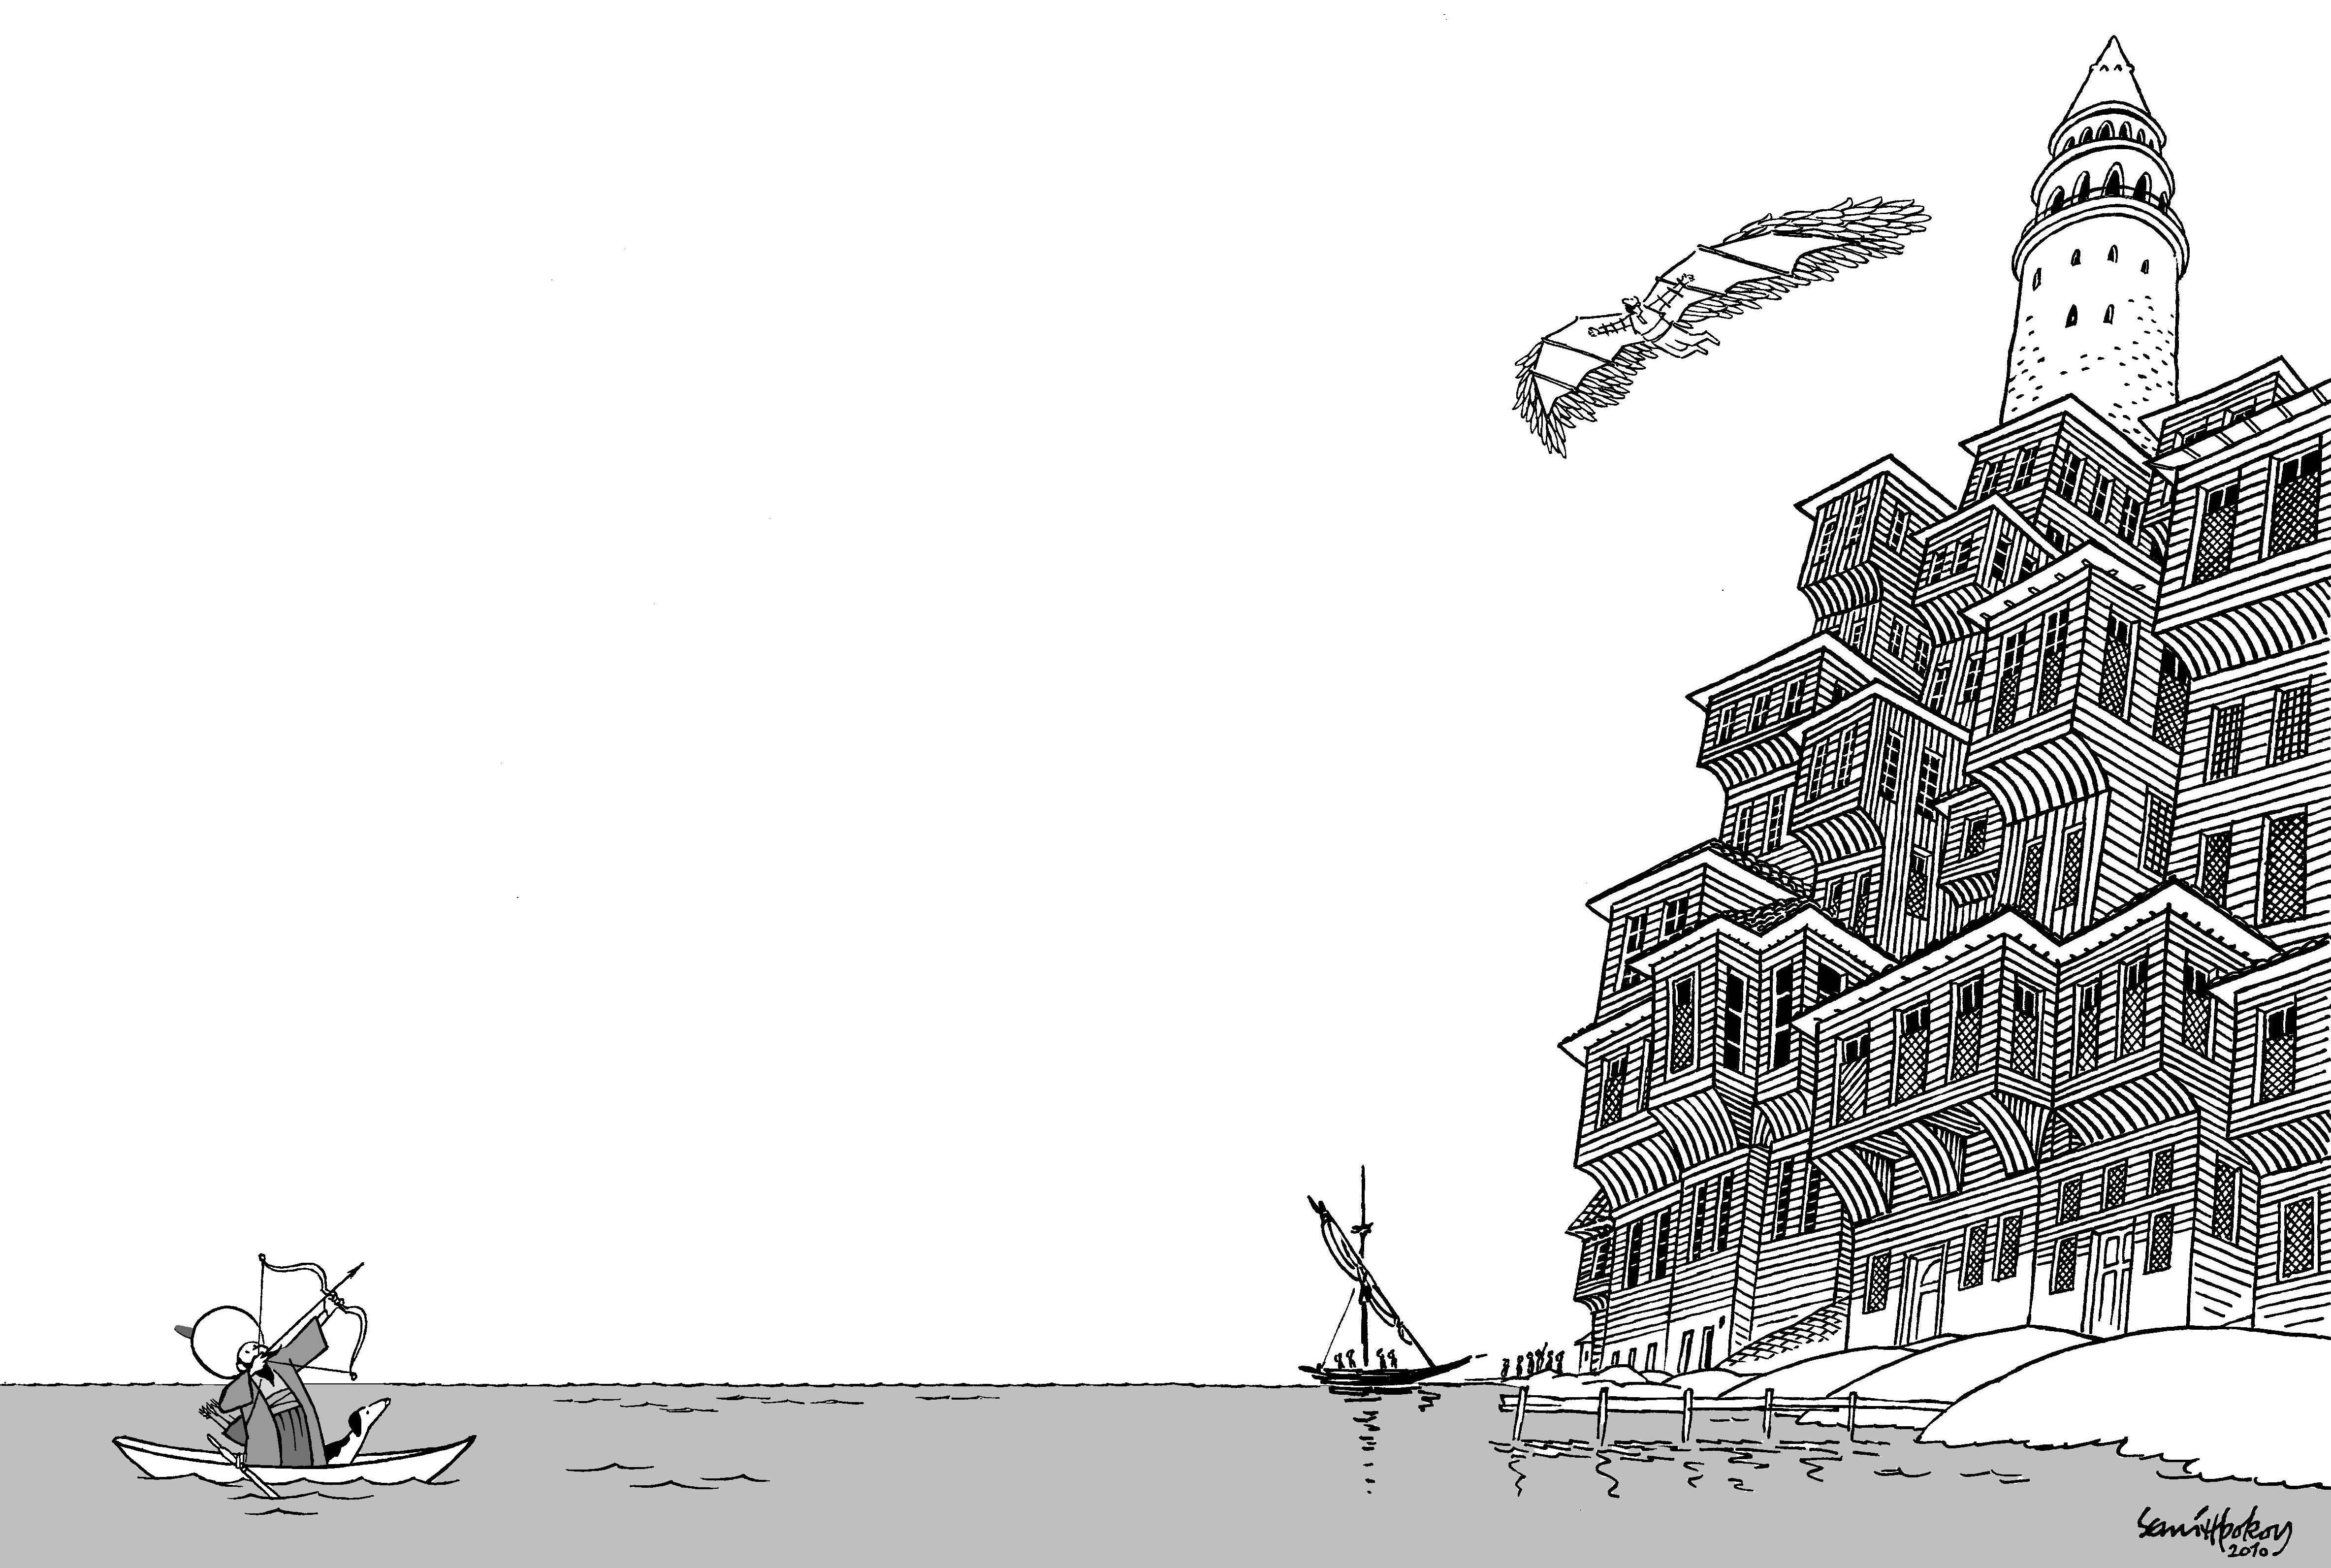 SEMIH-POROY-dessinateur-3